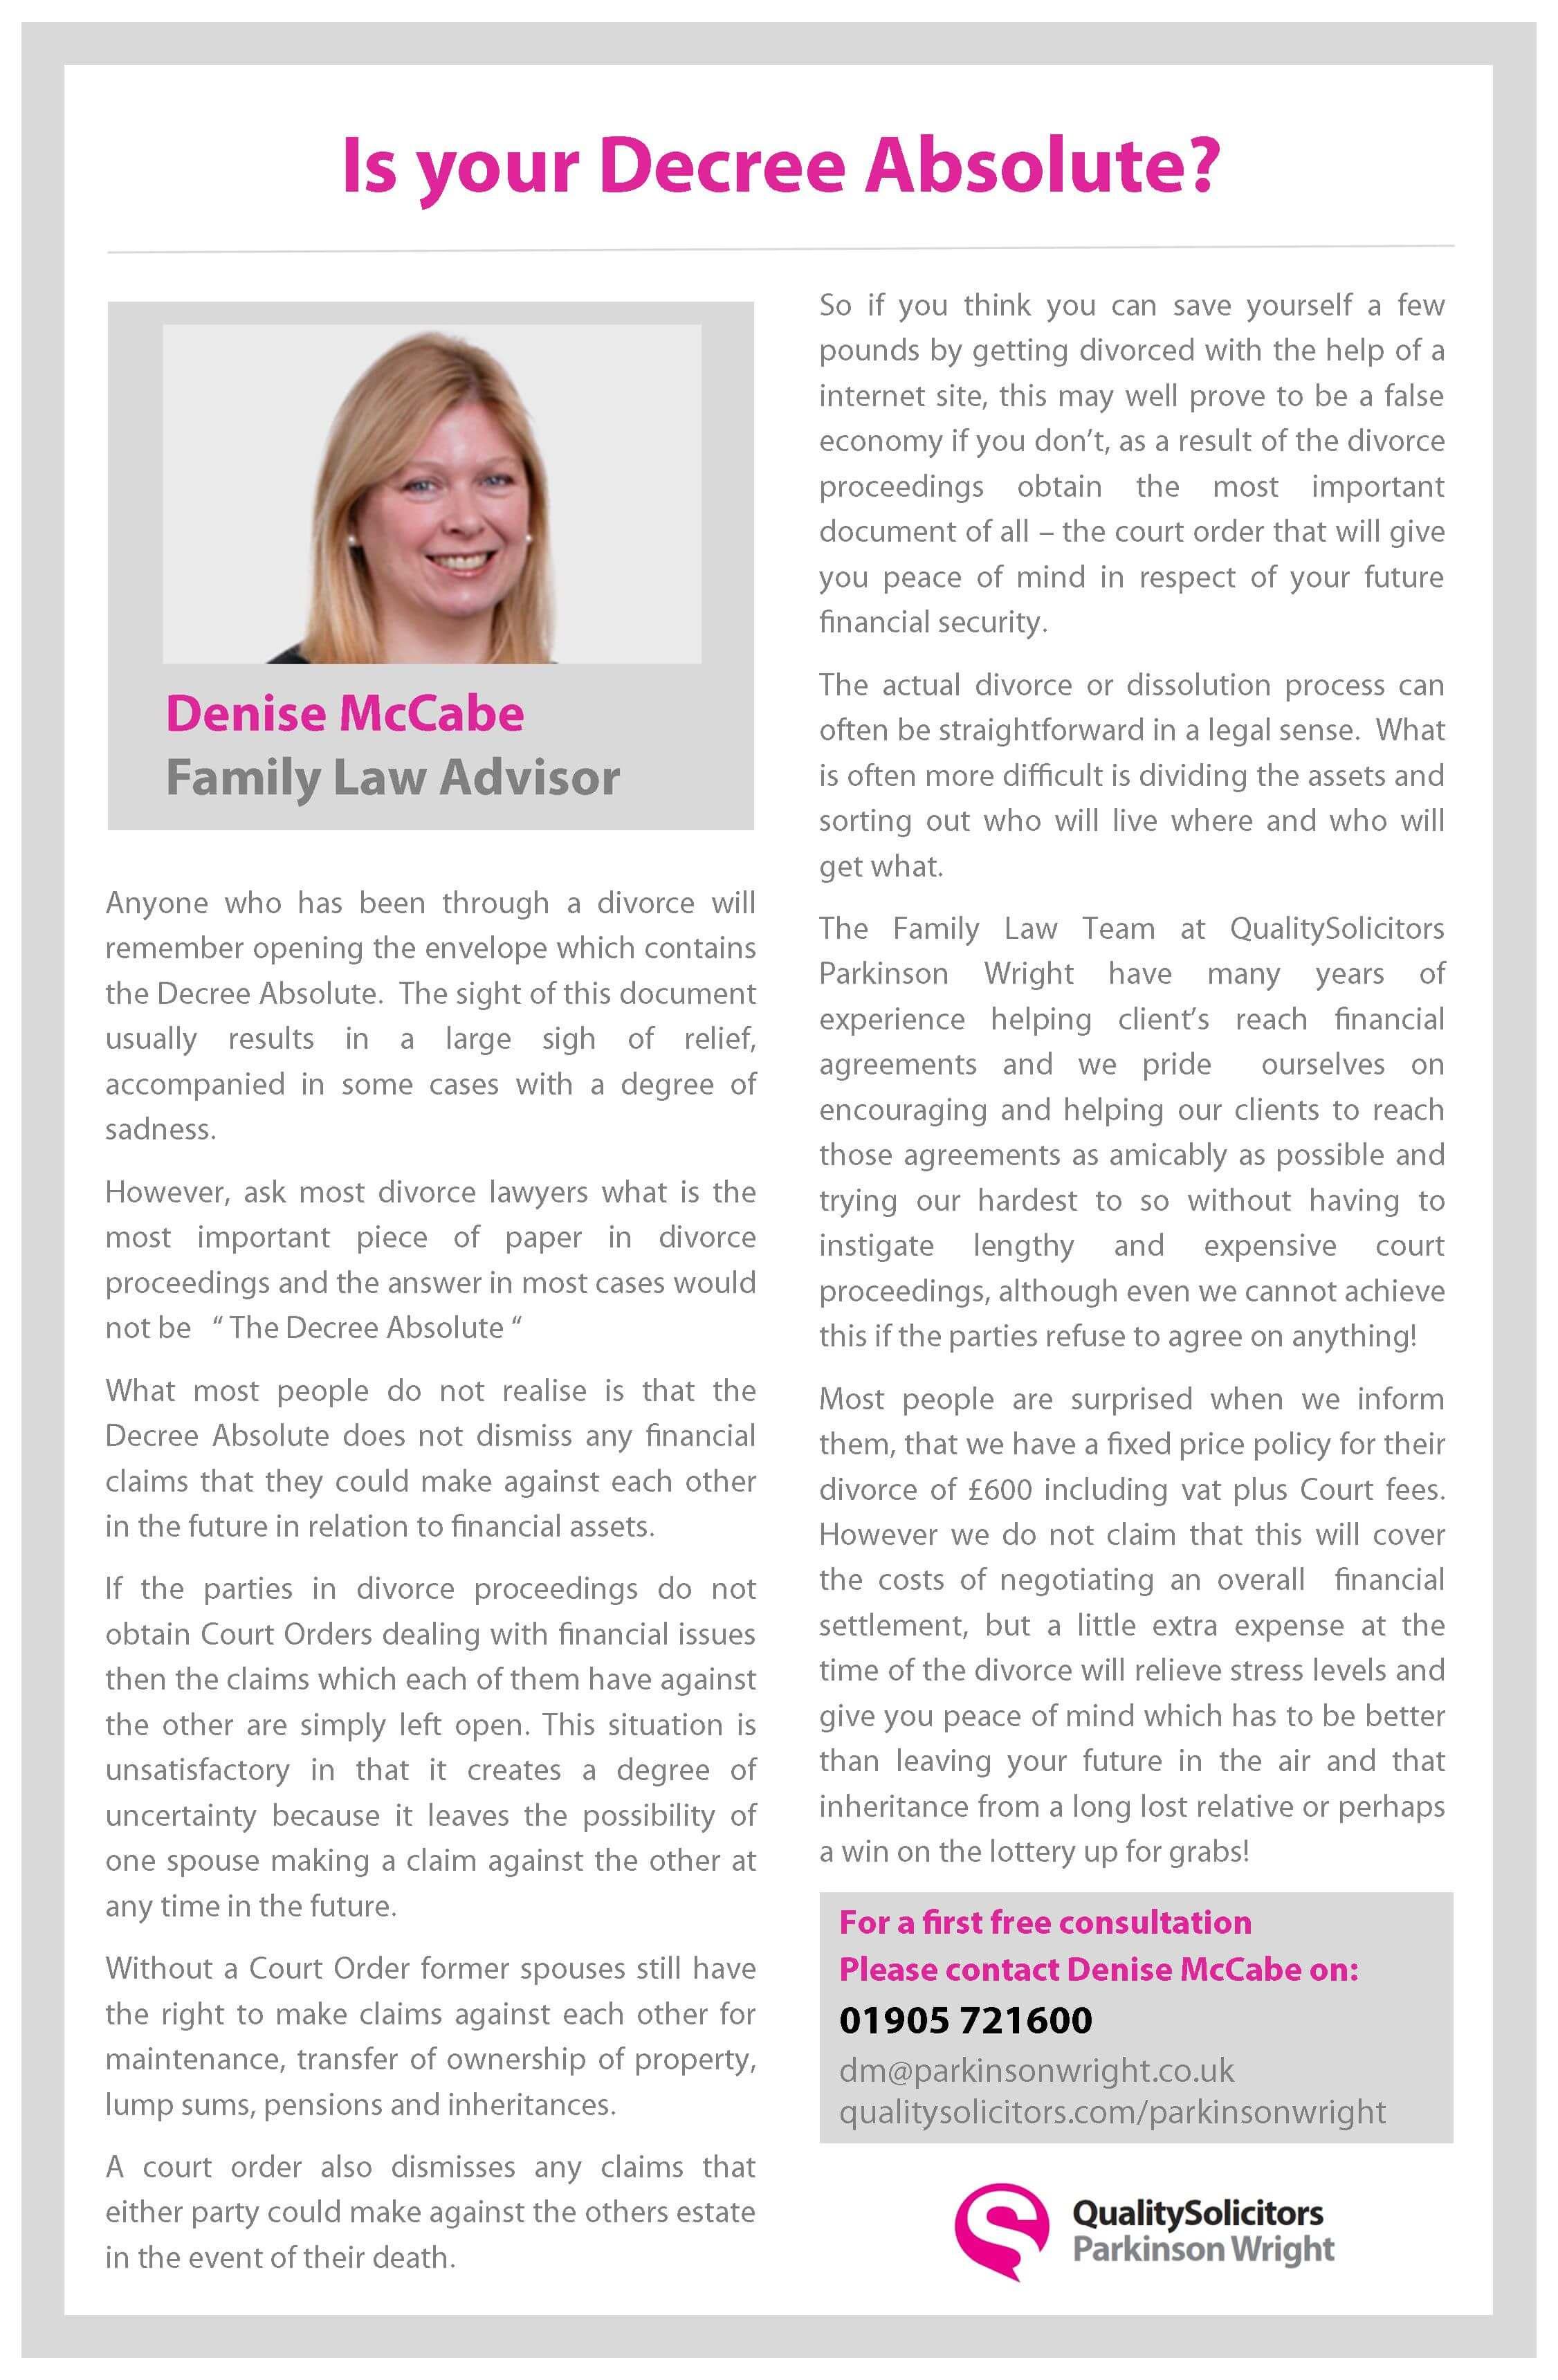 Denise Mccabe Qualitysolicitors Parkinson Wright